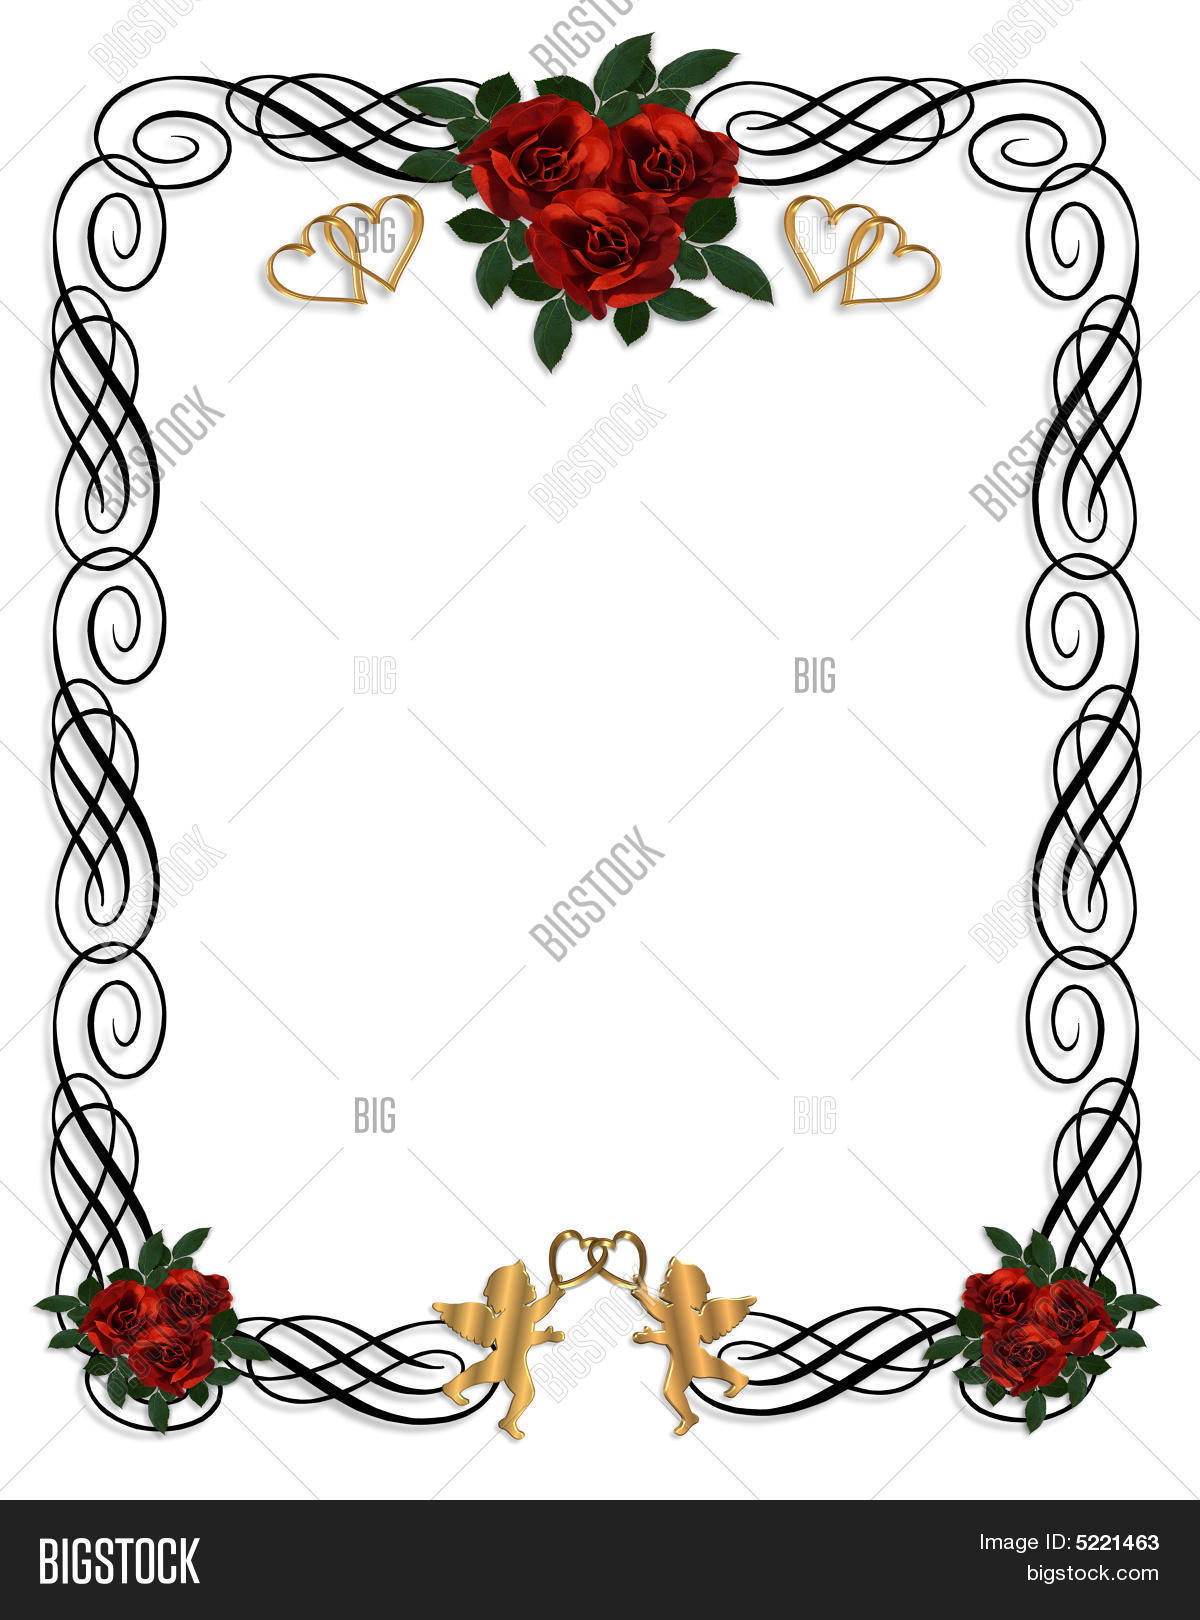 Red Roses Wedding Invitation Image & Photo   Bigstock